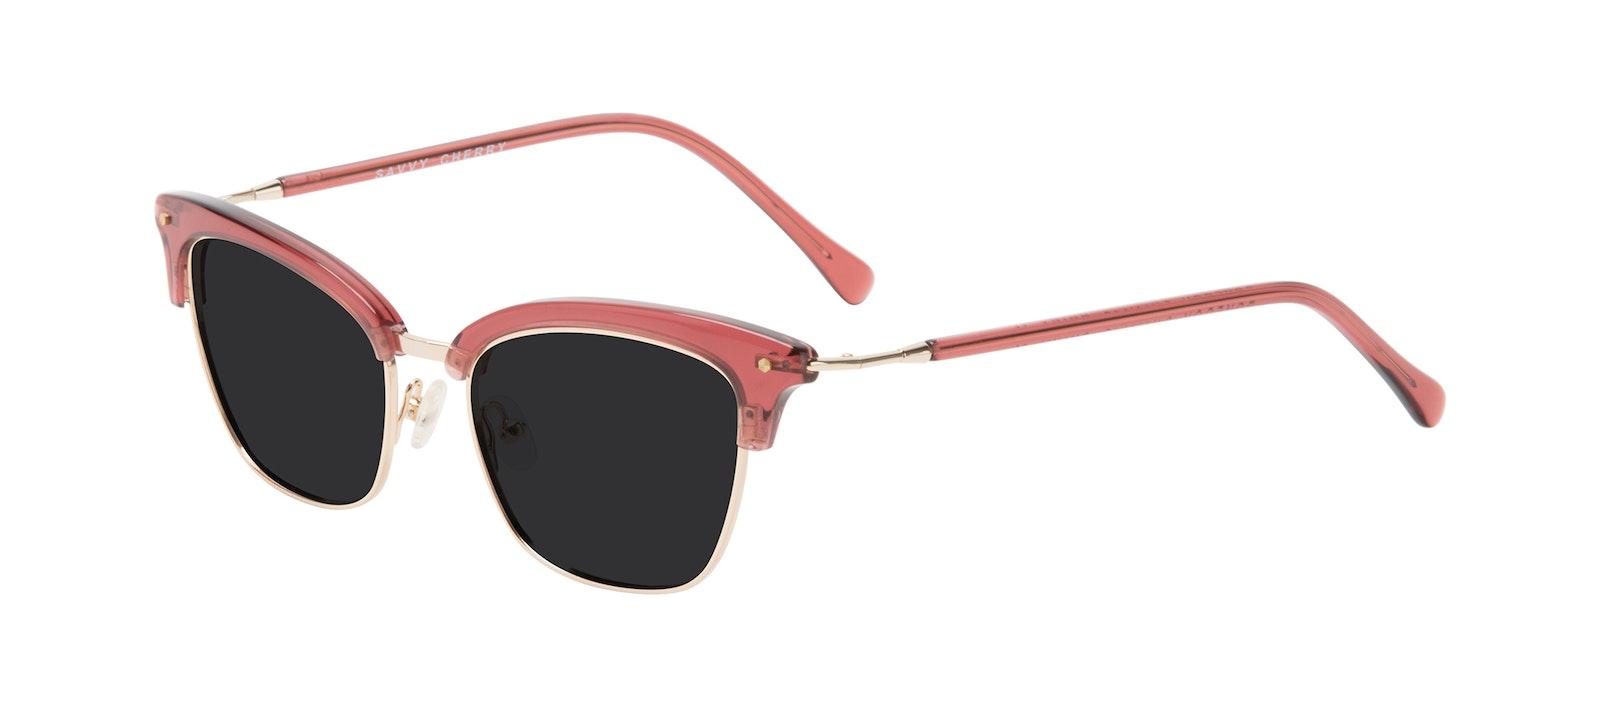 Affordable Fashion Glasses Cat Eye Sunglasses Women Savvy Cherry Tilt